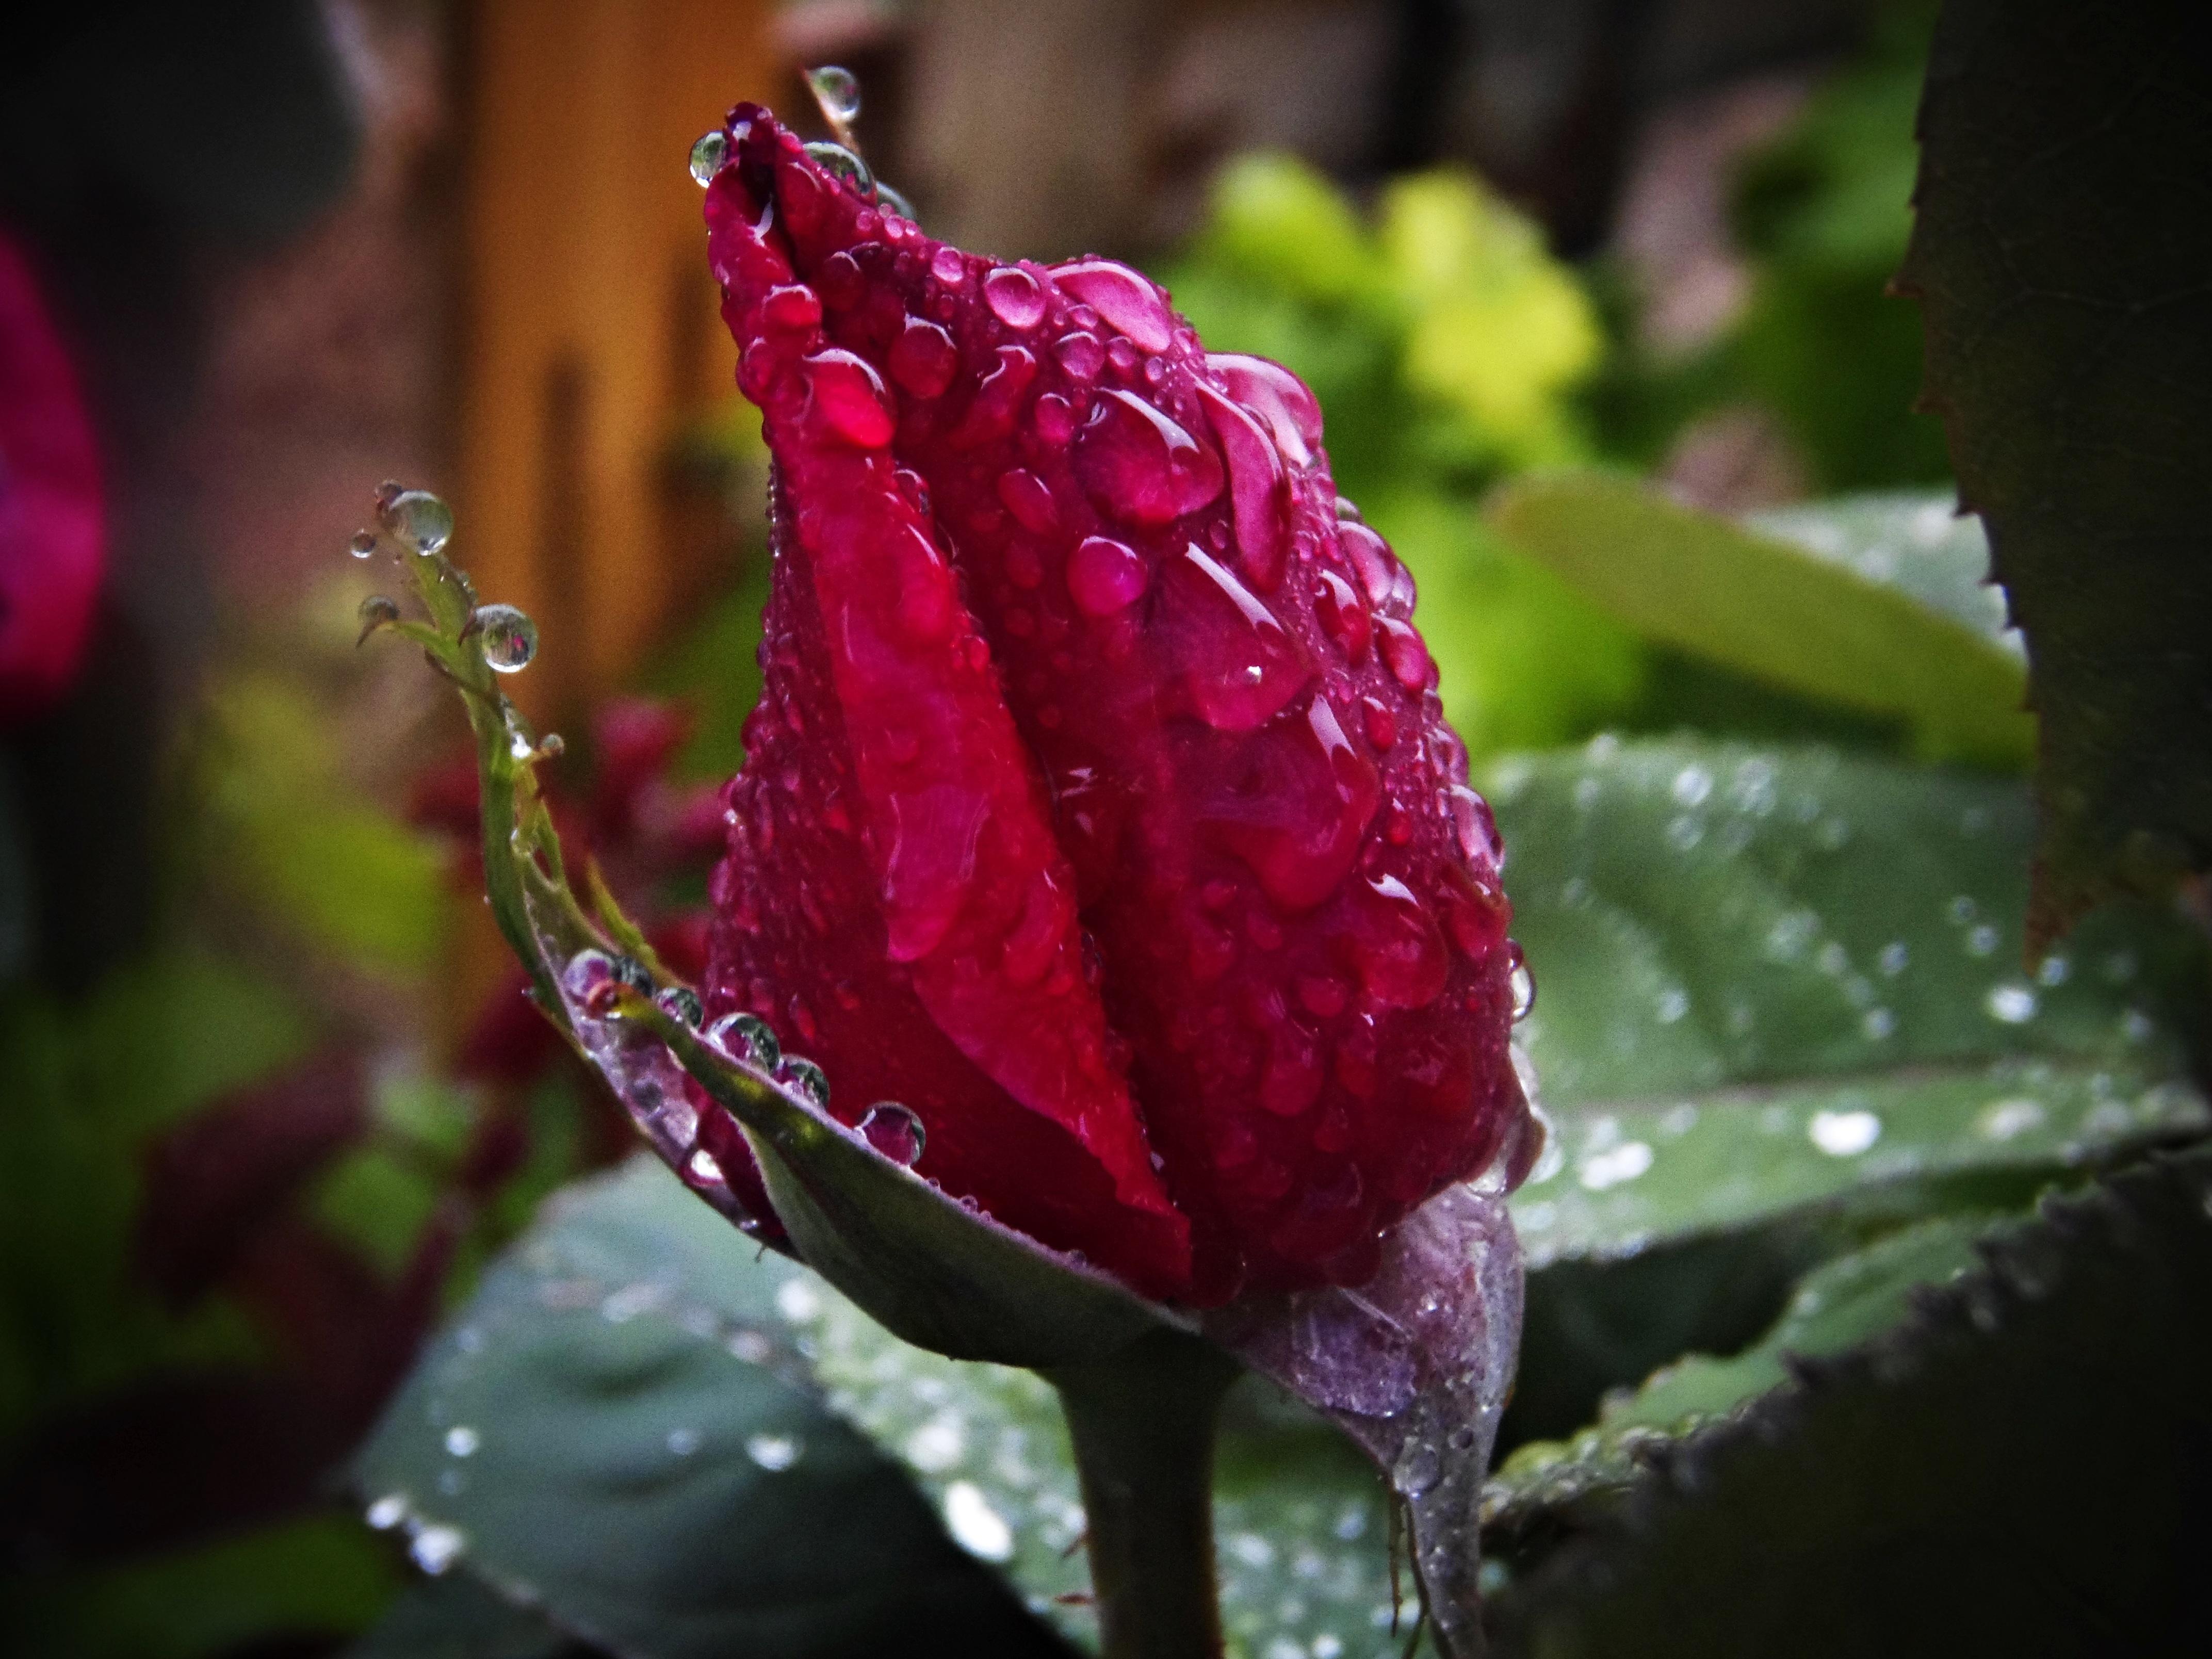 700+ Gambar Bunga Mawar Basah  Terbaik